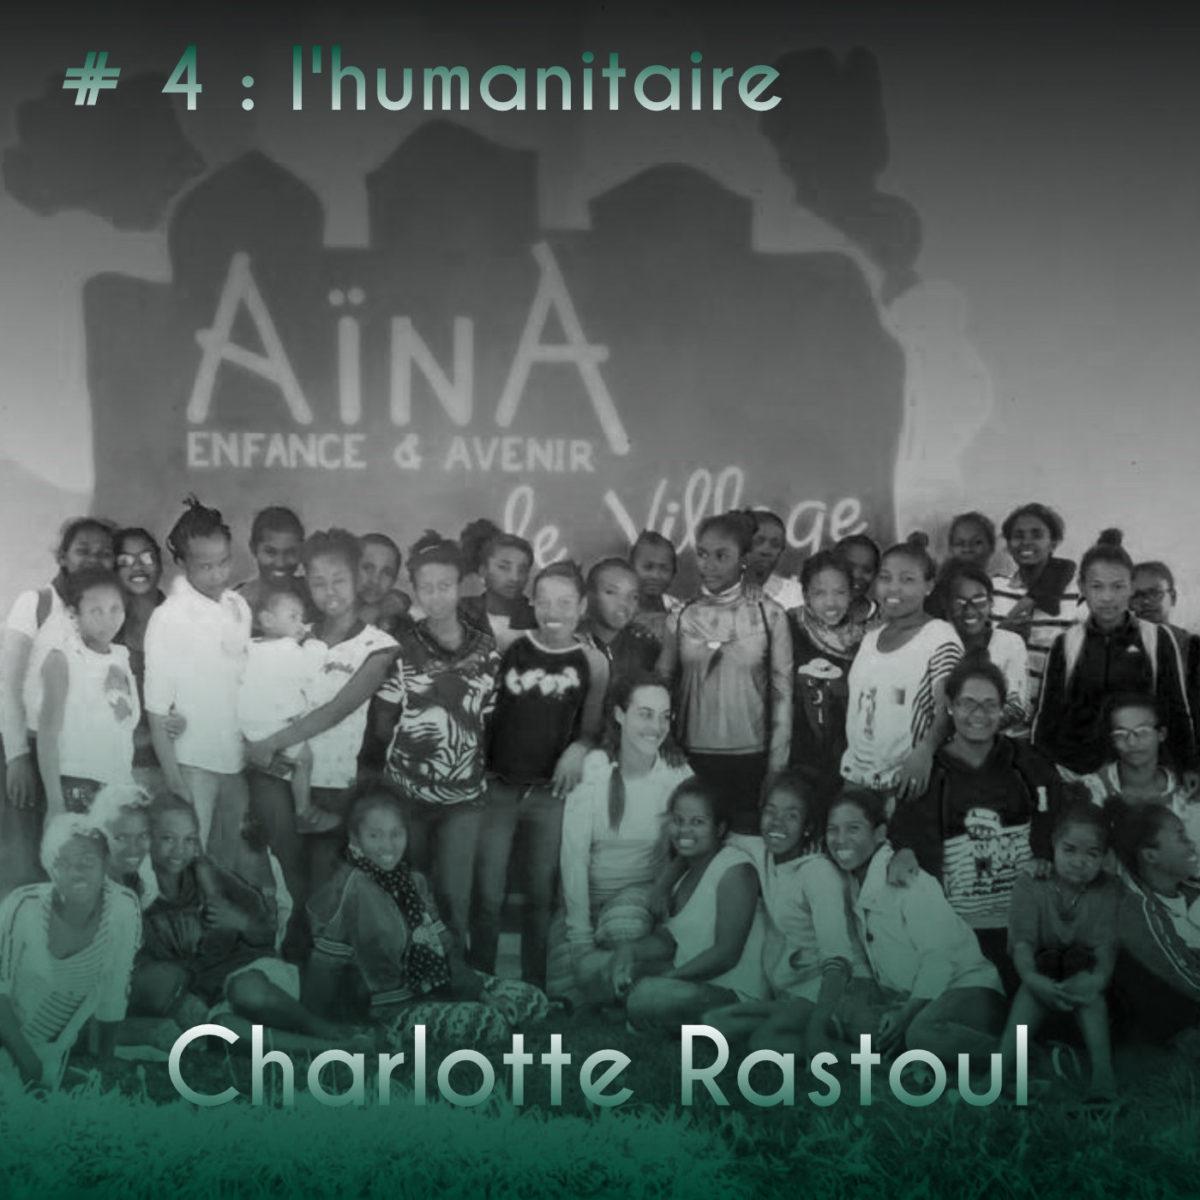 Couverture Podcast #4 Charlotte Rastoul